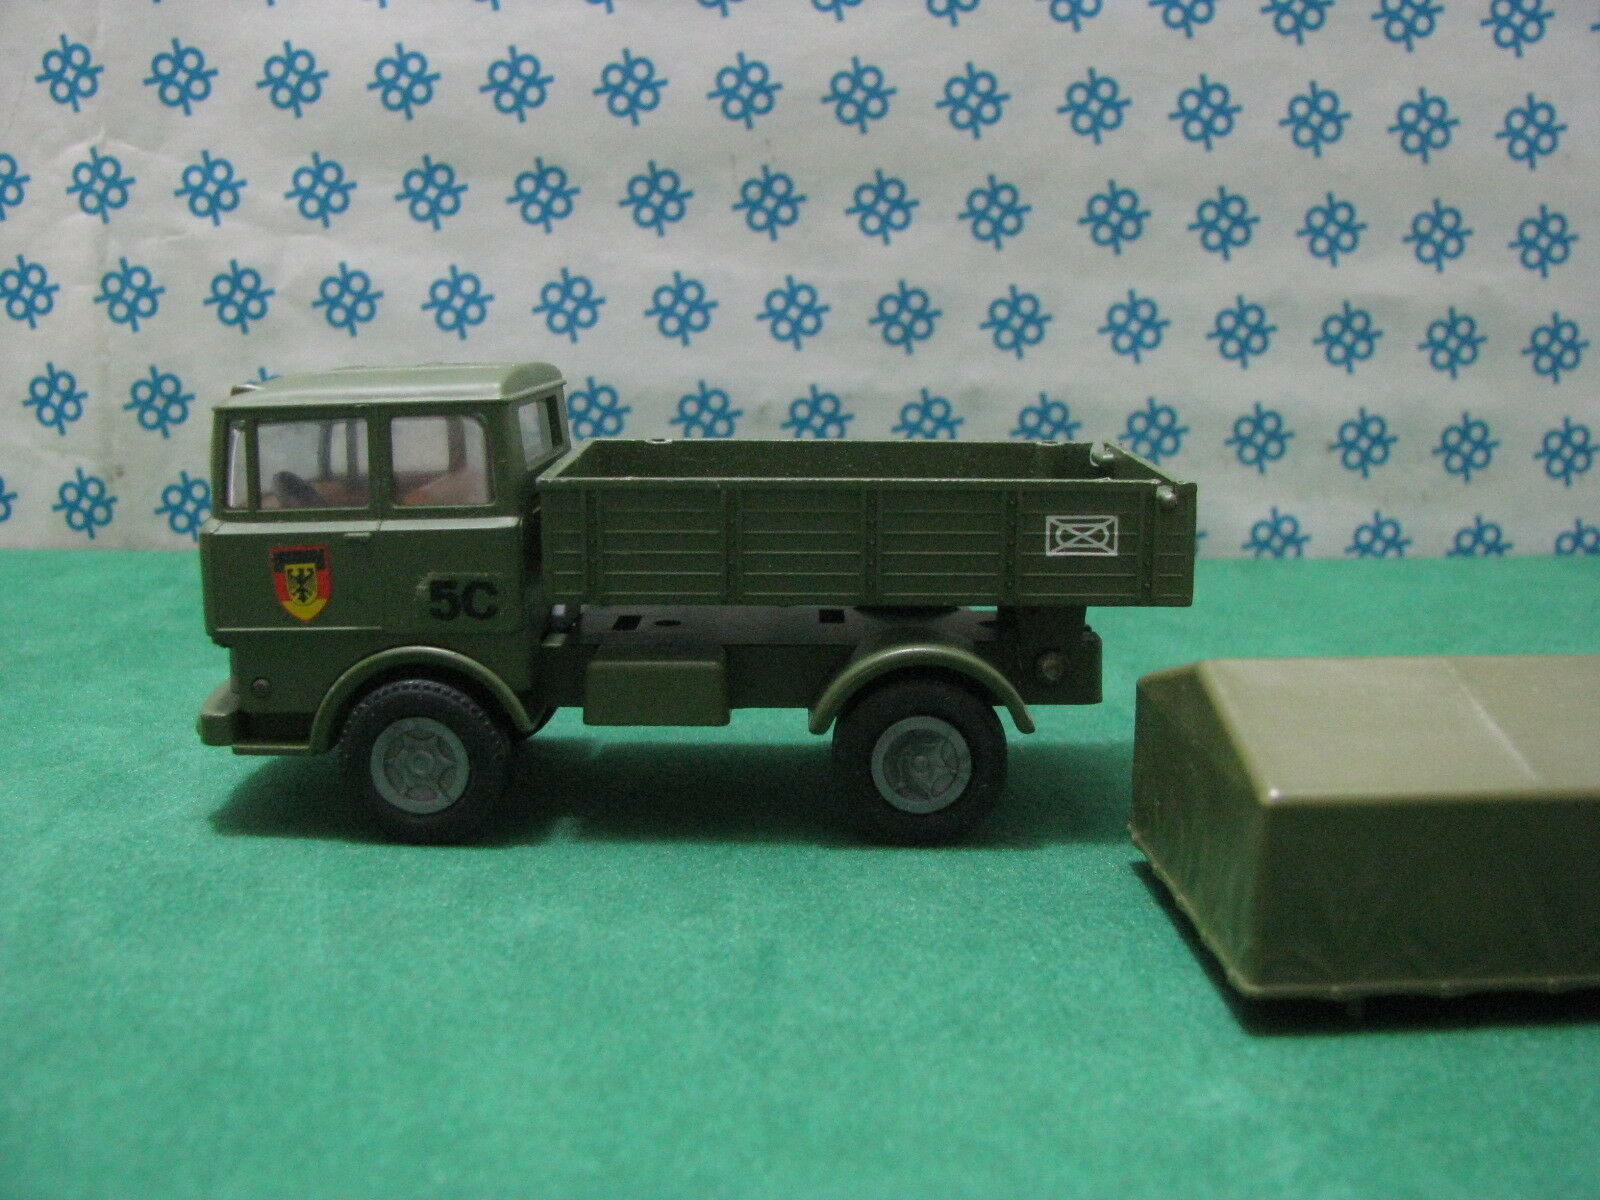 Vintage - FAUN LKW Military box tilt tilt tilt trailers - MINI-GAMA 920 W. Germany 2d9969